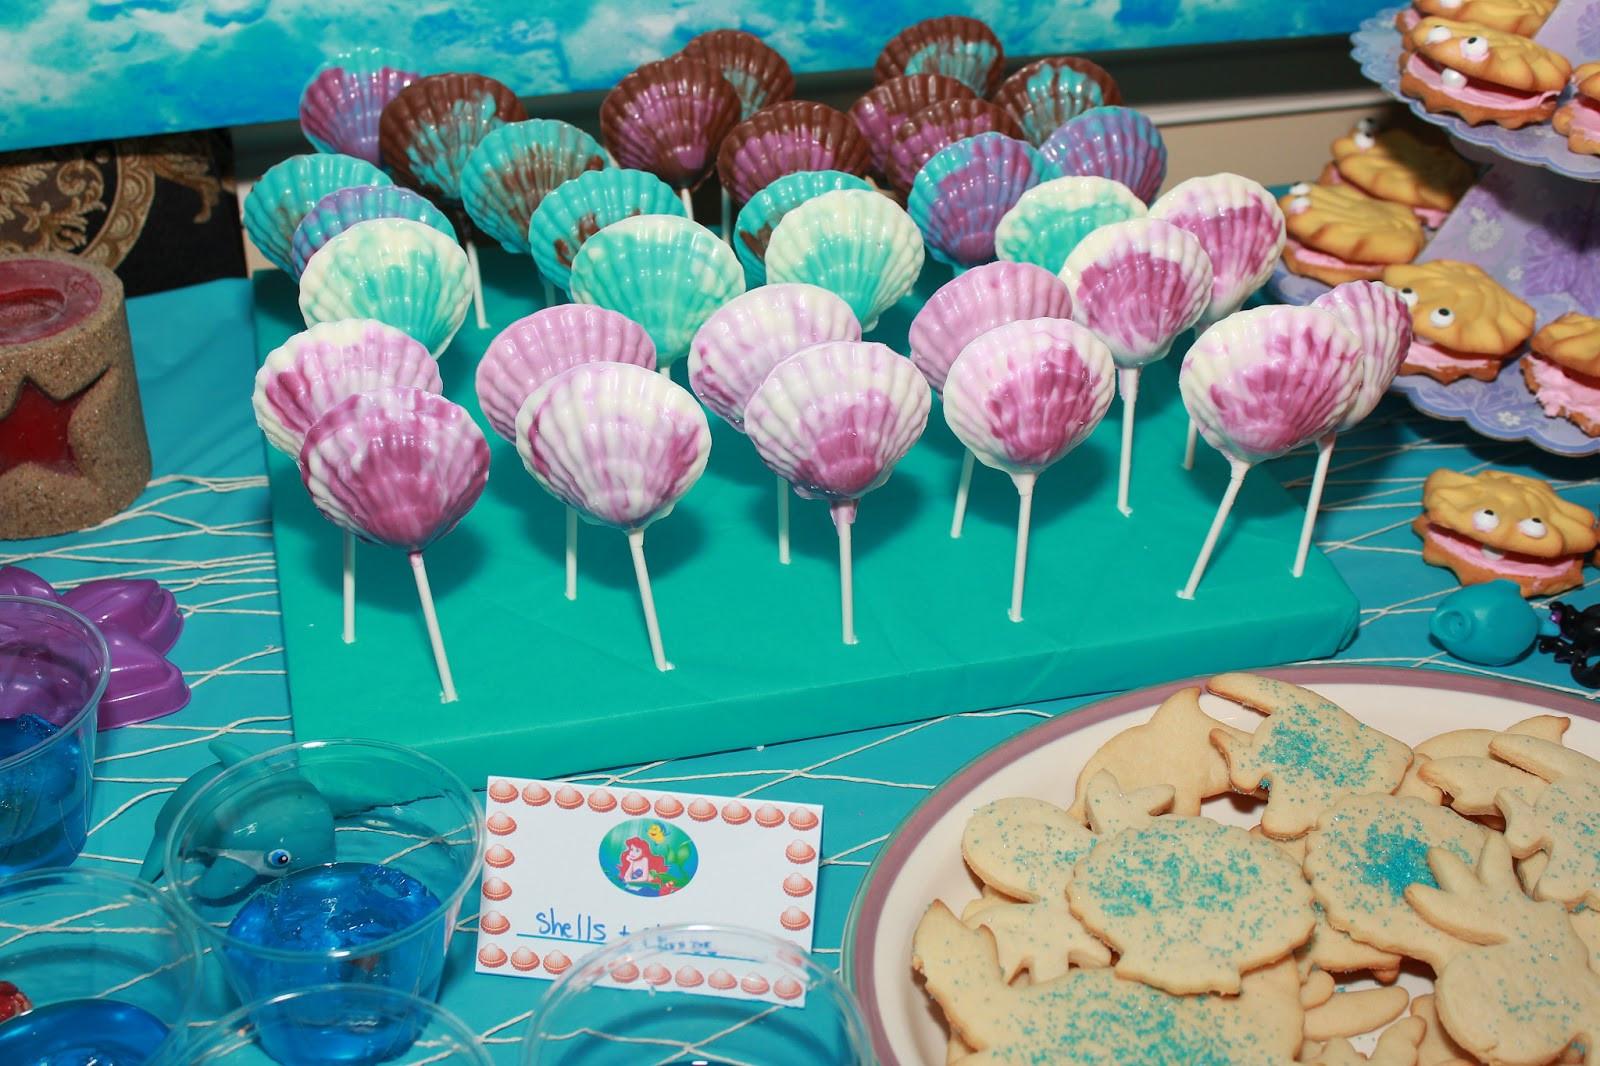 Little Mermaid Party Decoration Ideas  Melissa s Party Ideas The Little Mermaid Party Ideas